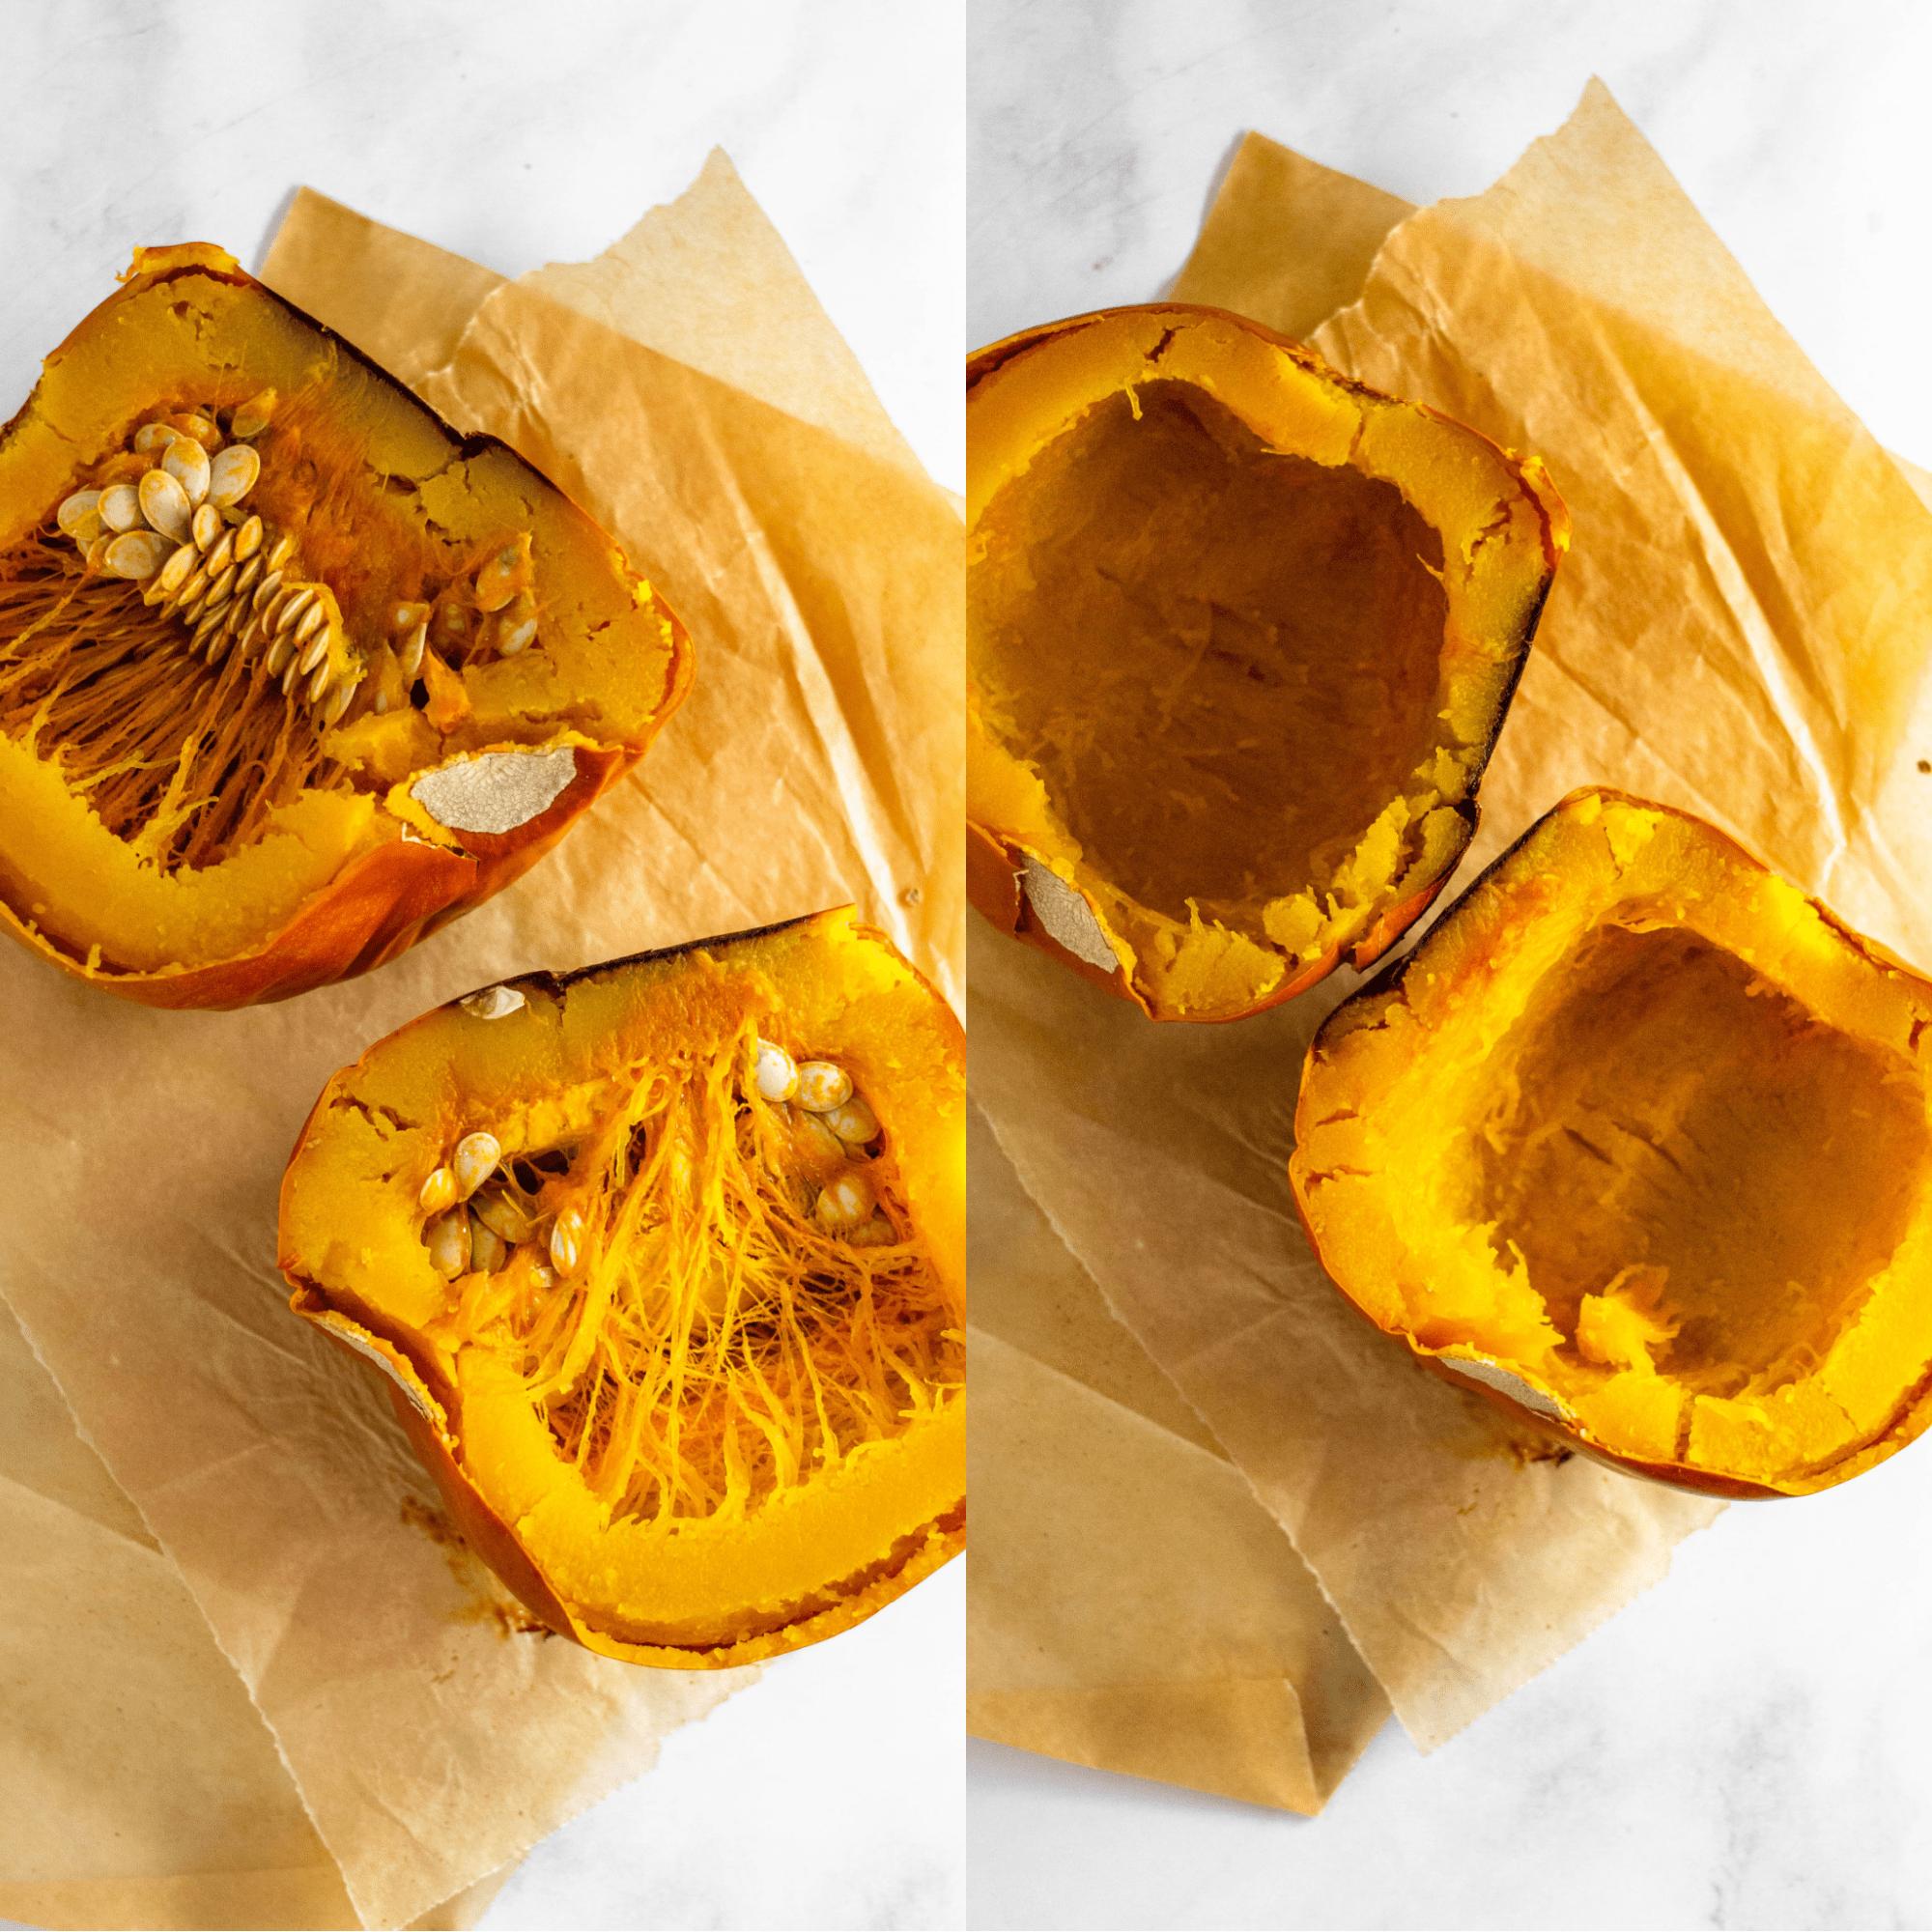 How to Make Homemade Pumpkin Puree #pumpkinrecipes #pumpkinpuree